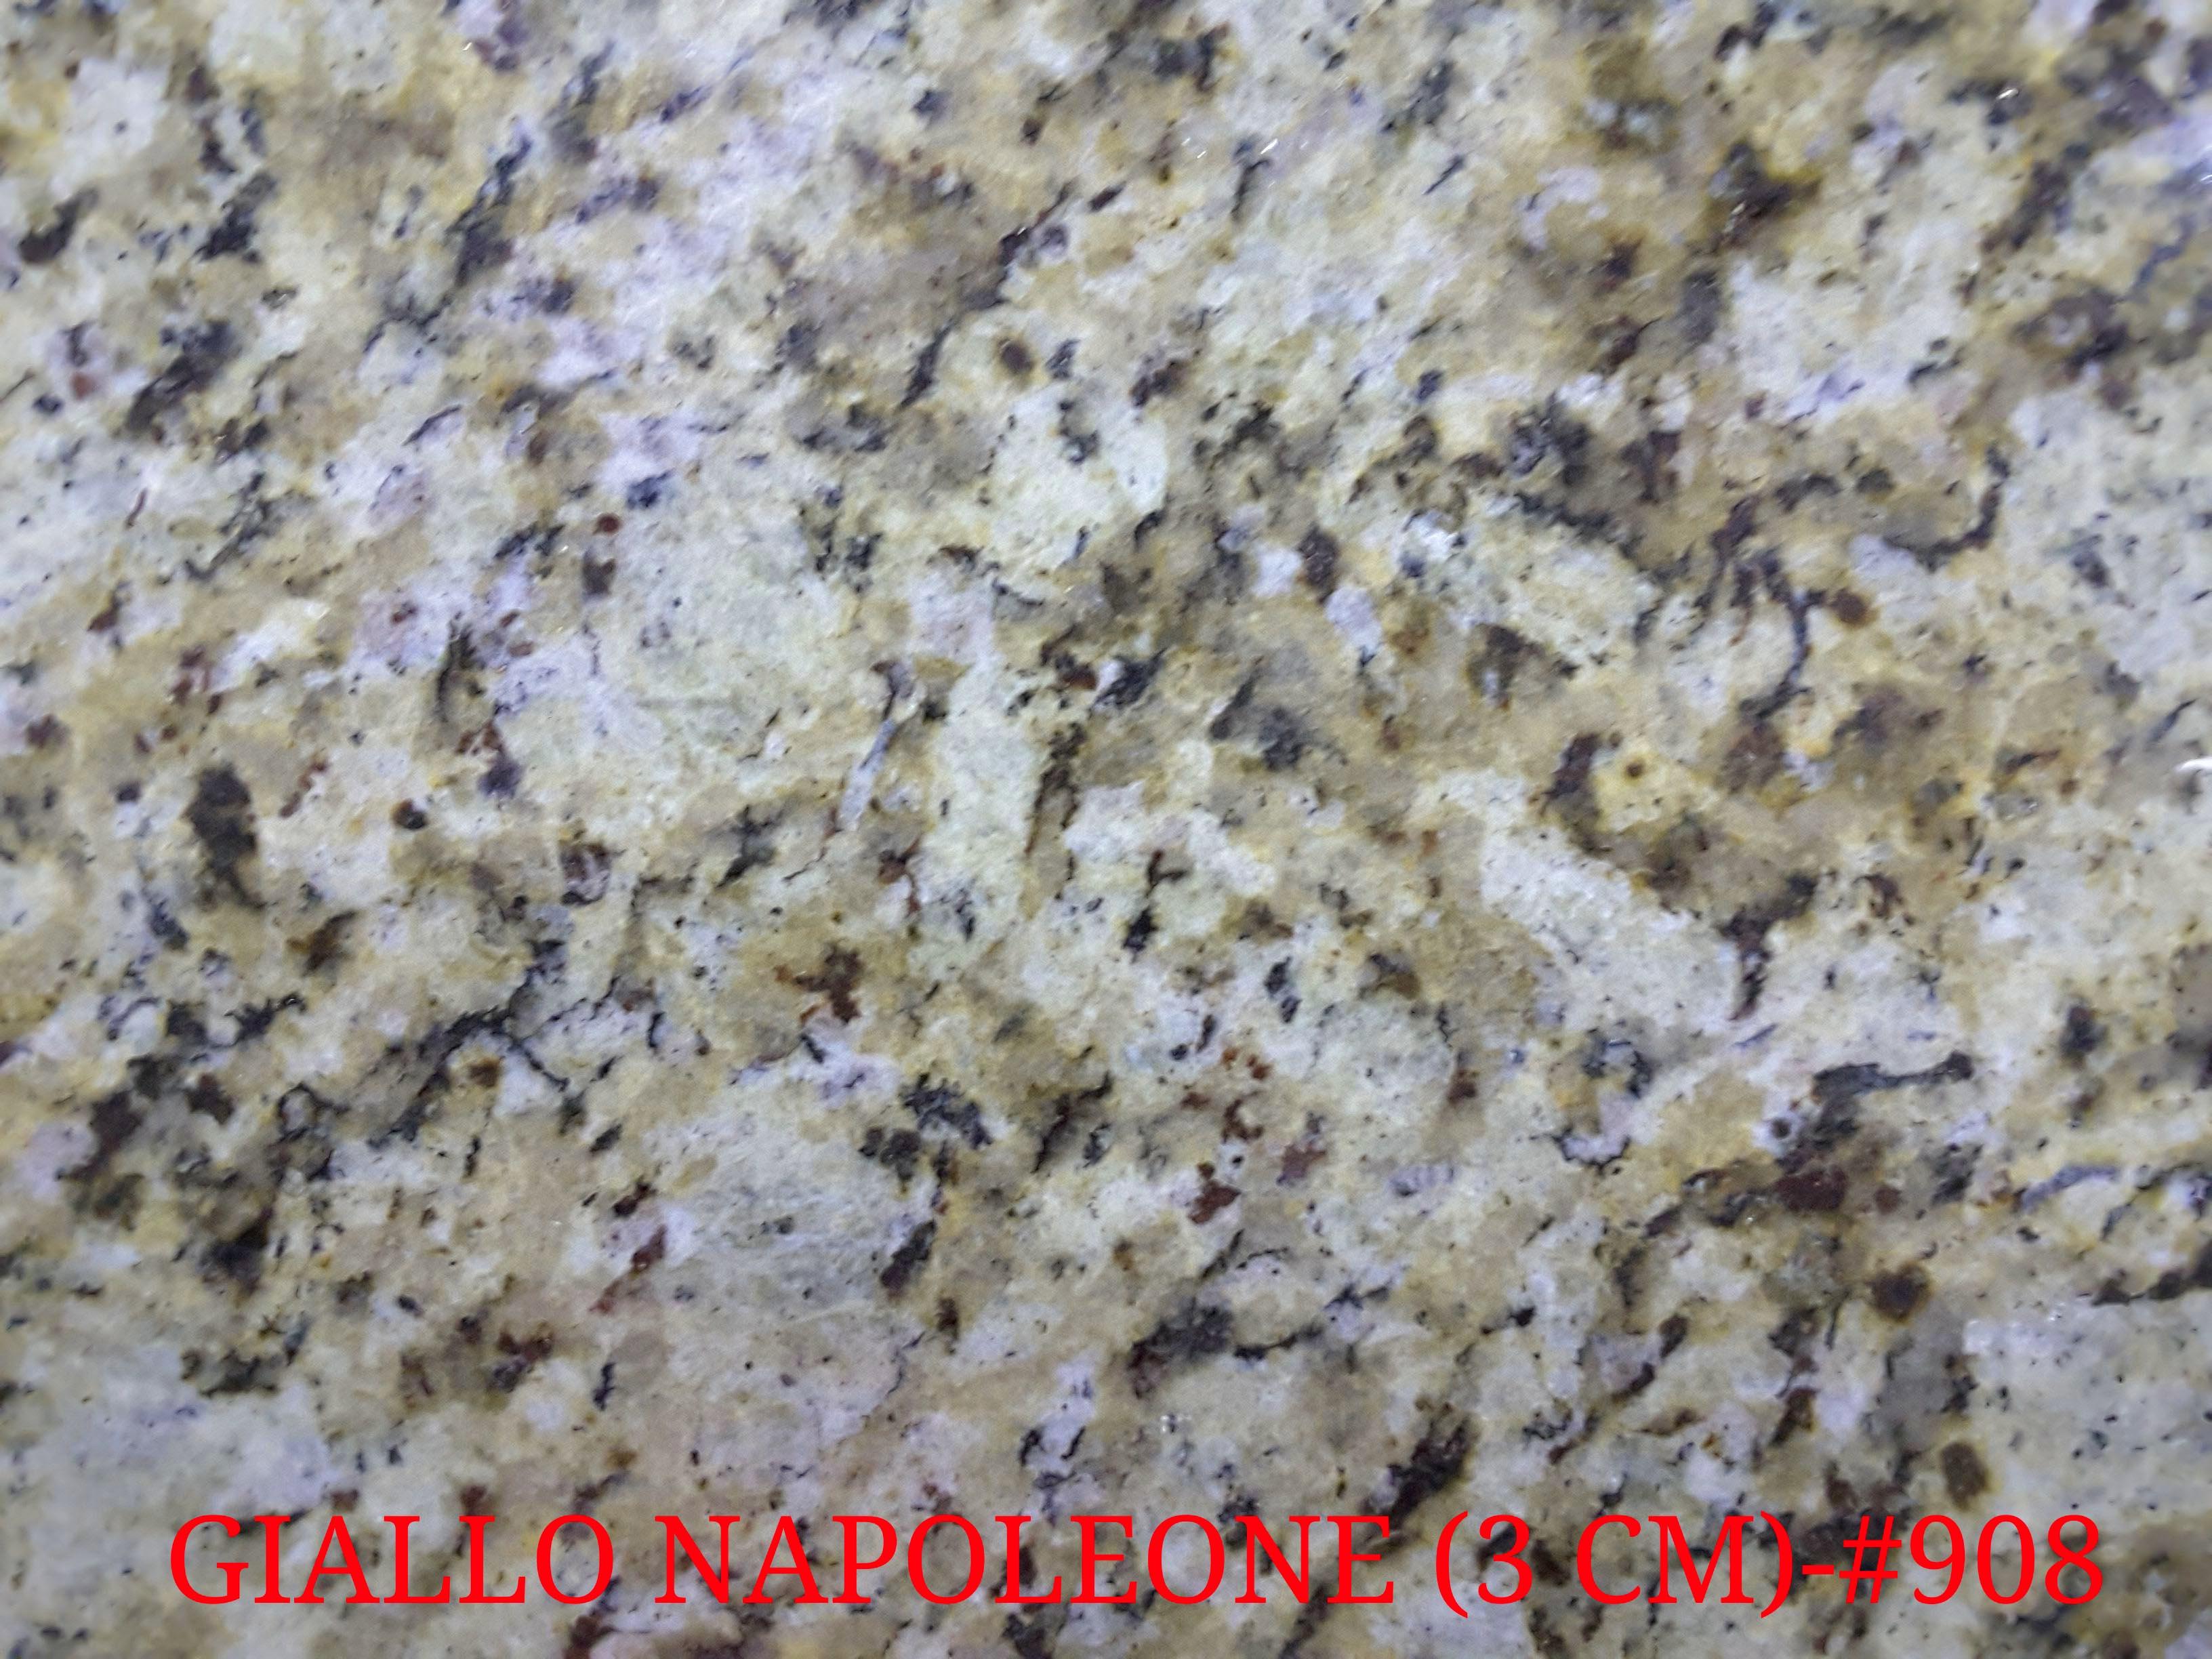 GIALLO NAPOLEONE (3 CM)-#908